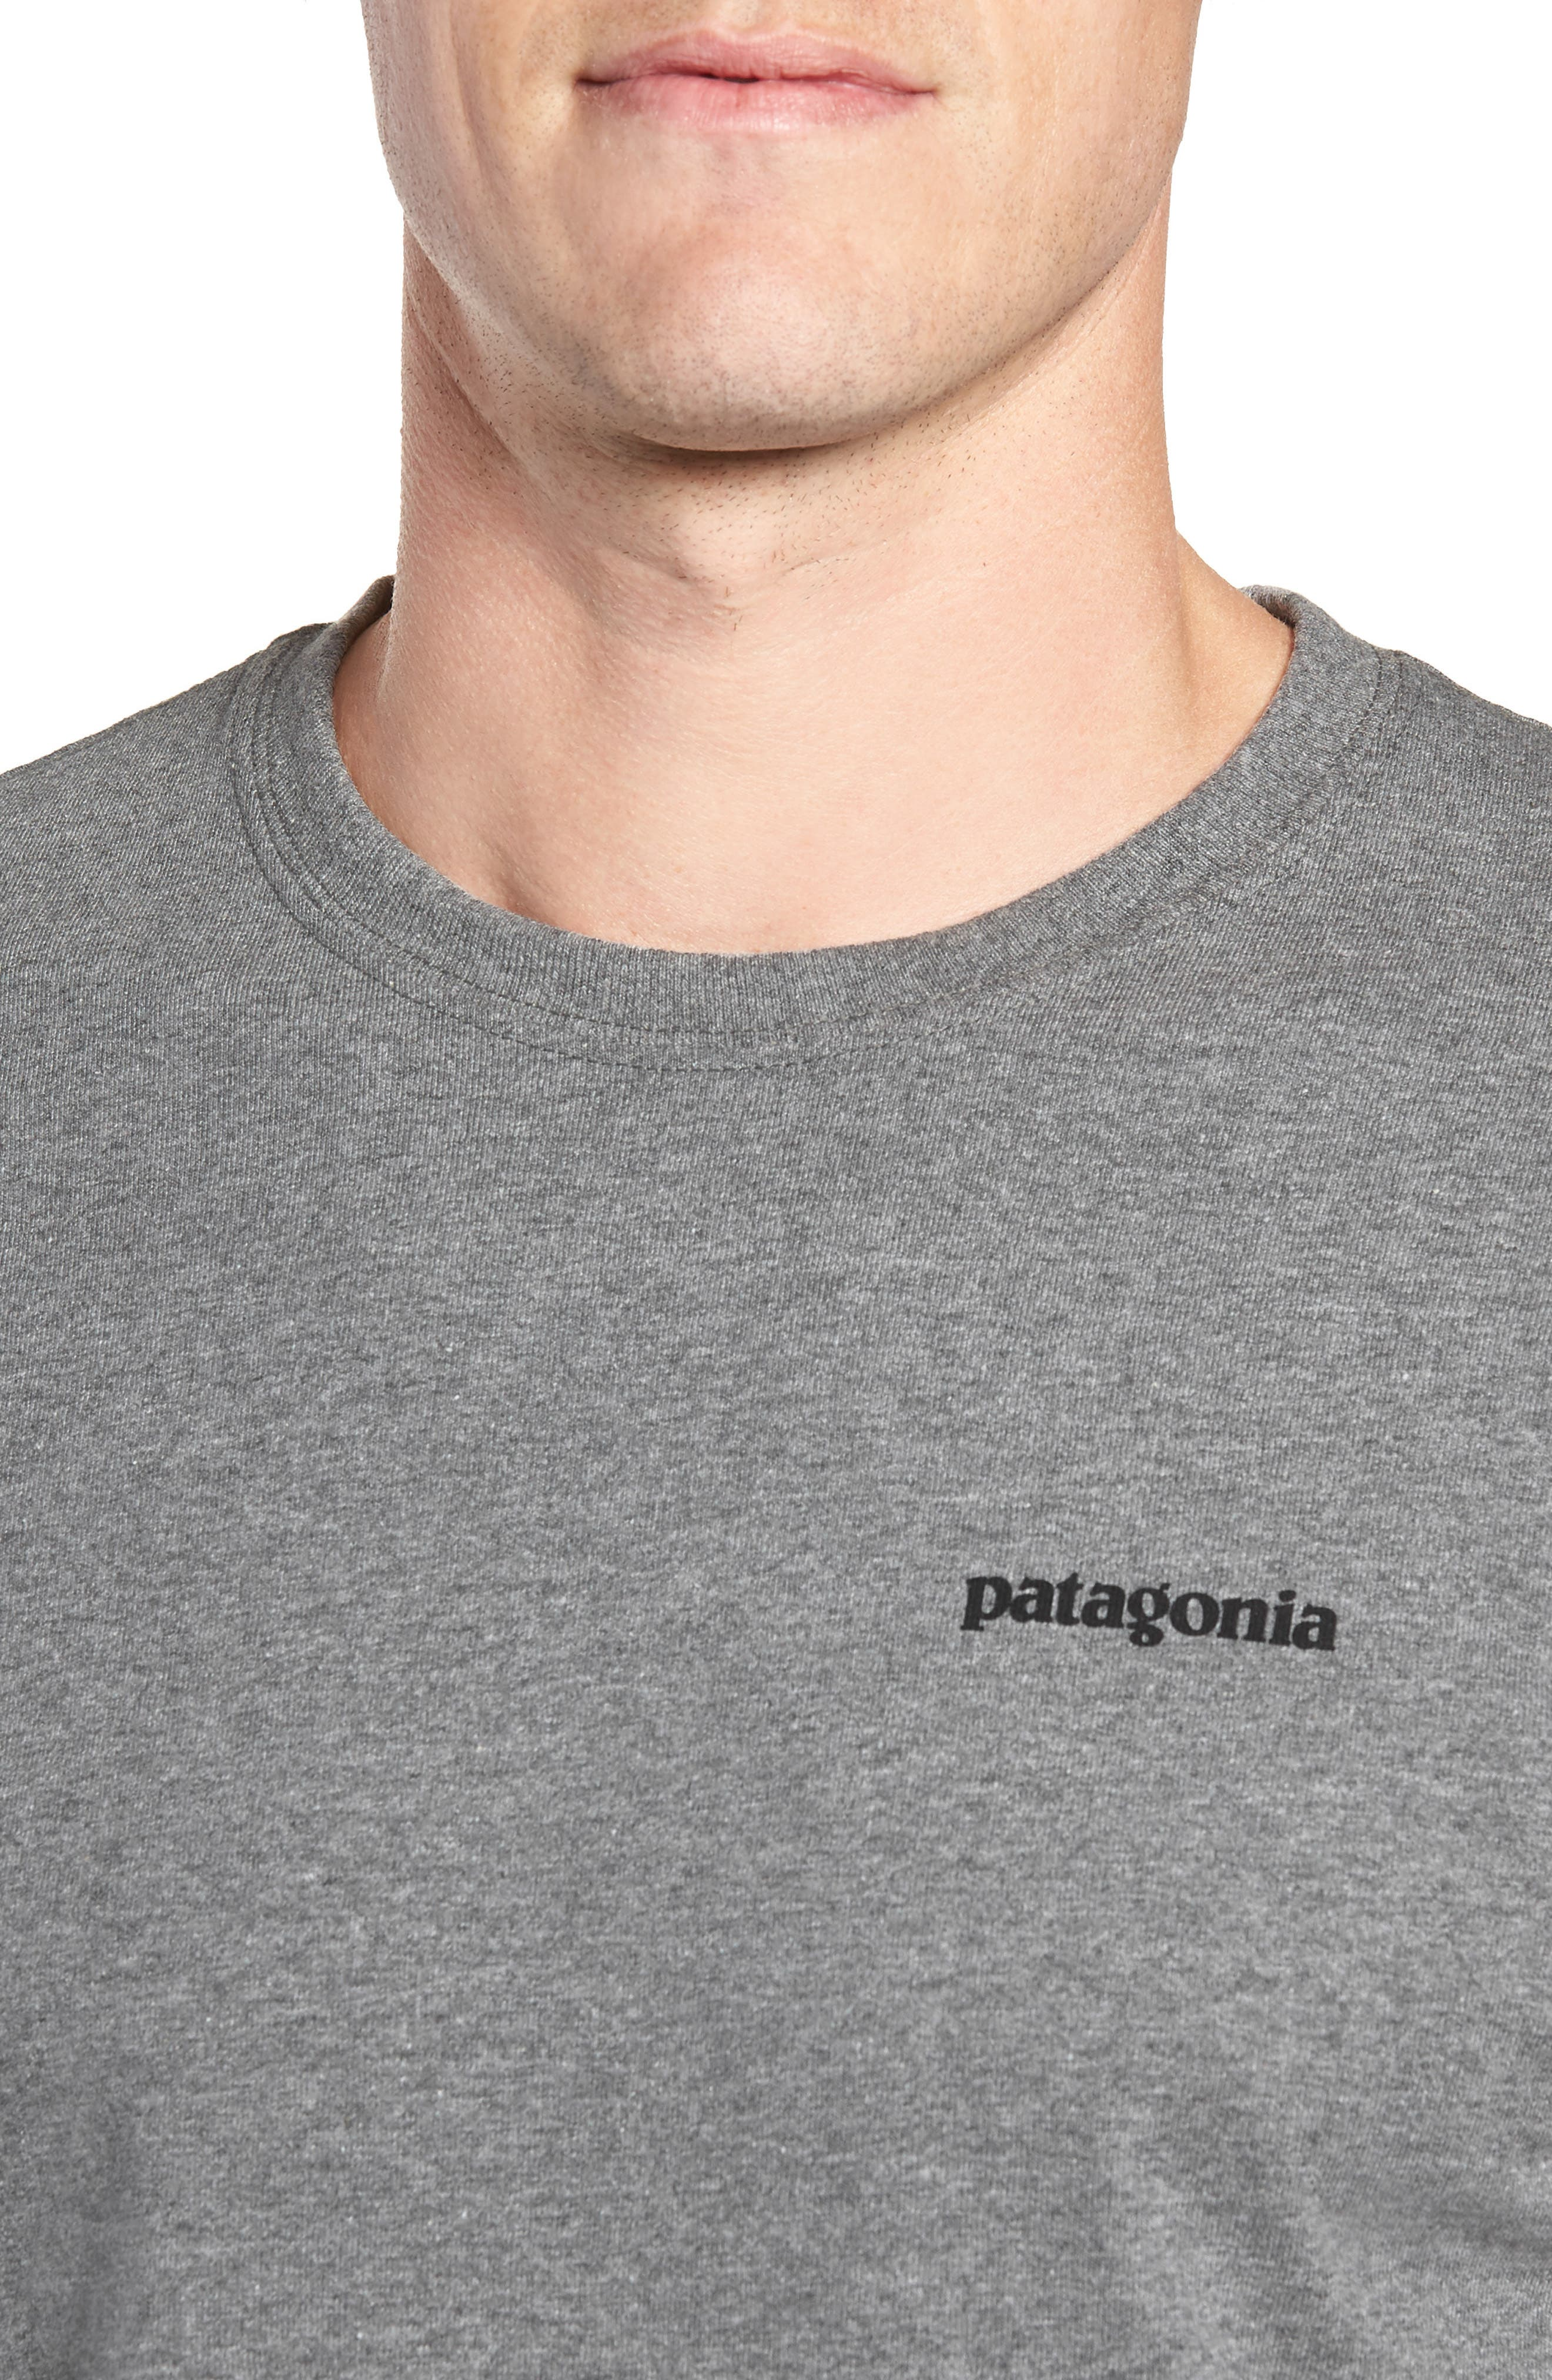 PATAGONIA,                             Fitz Roy Responsibili-Tee Long-Sleeve T-Shirt,                             Alternate thumbnail 4, color,                             020